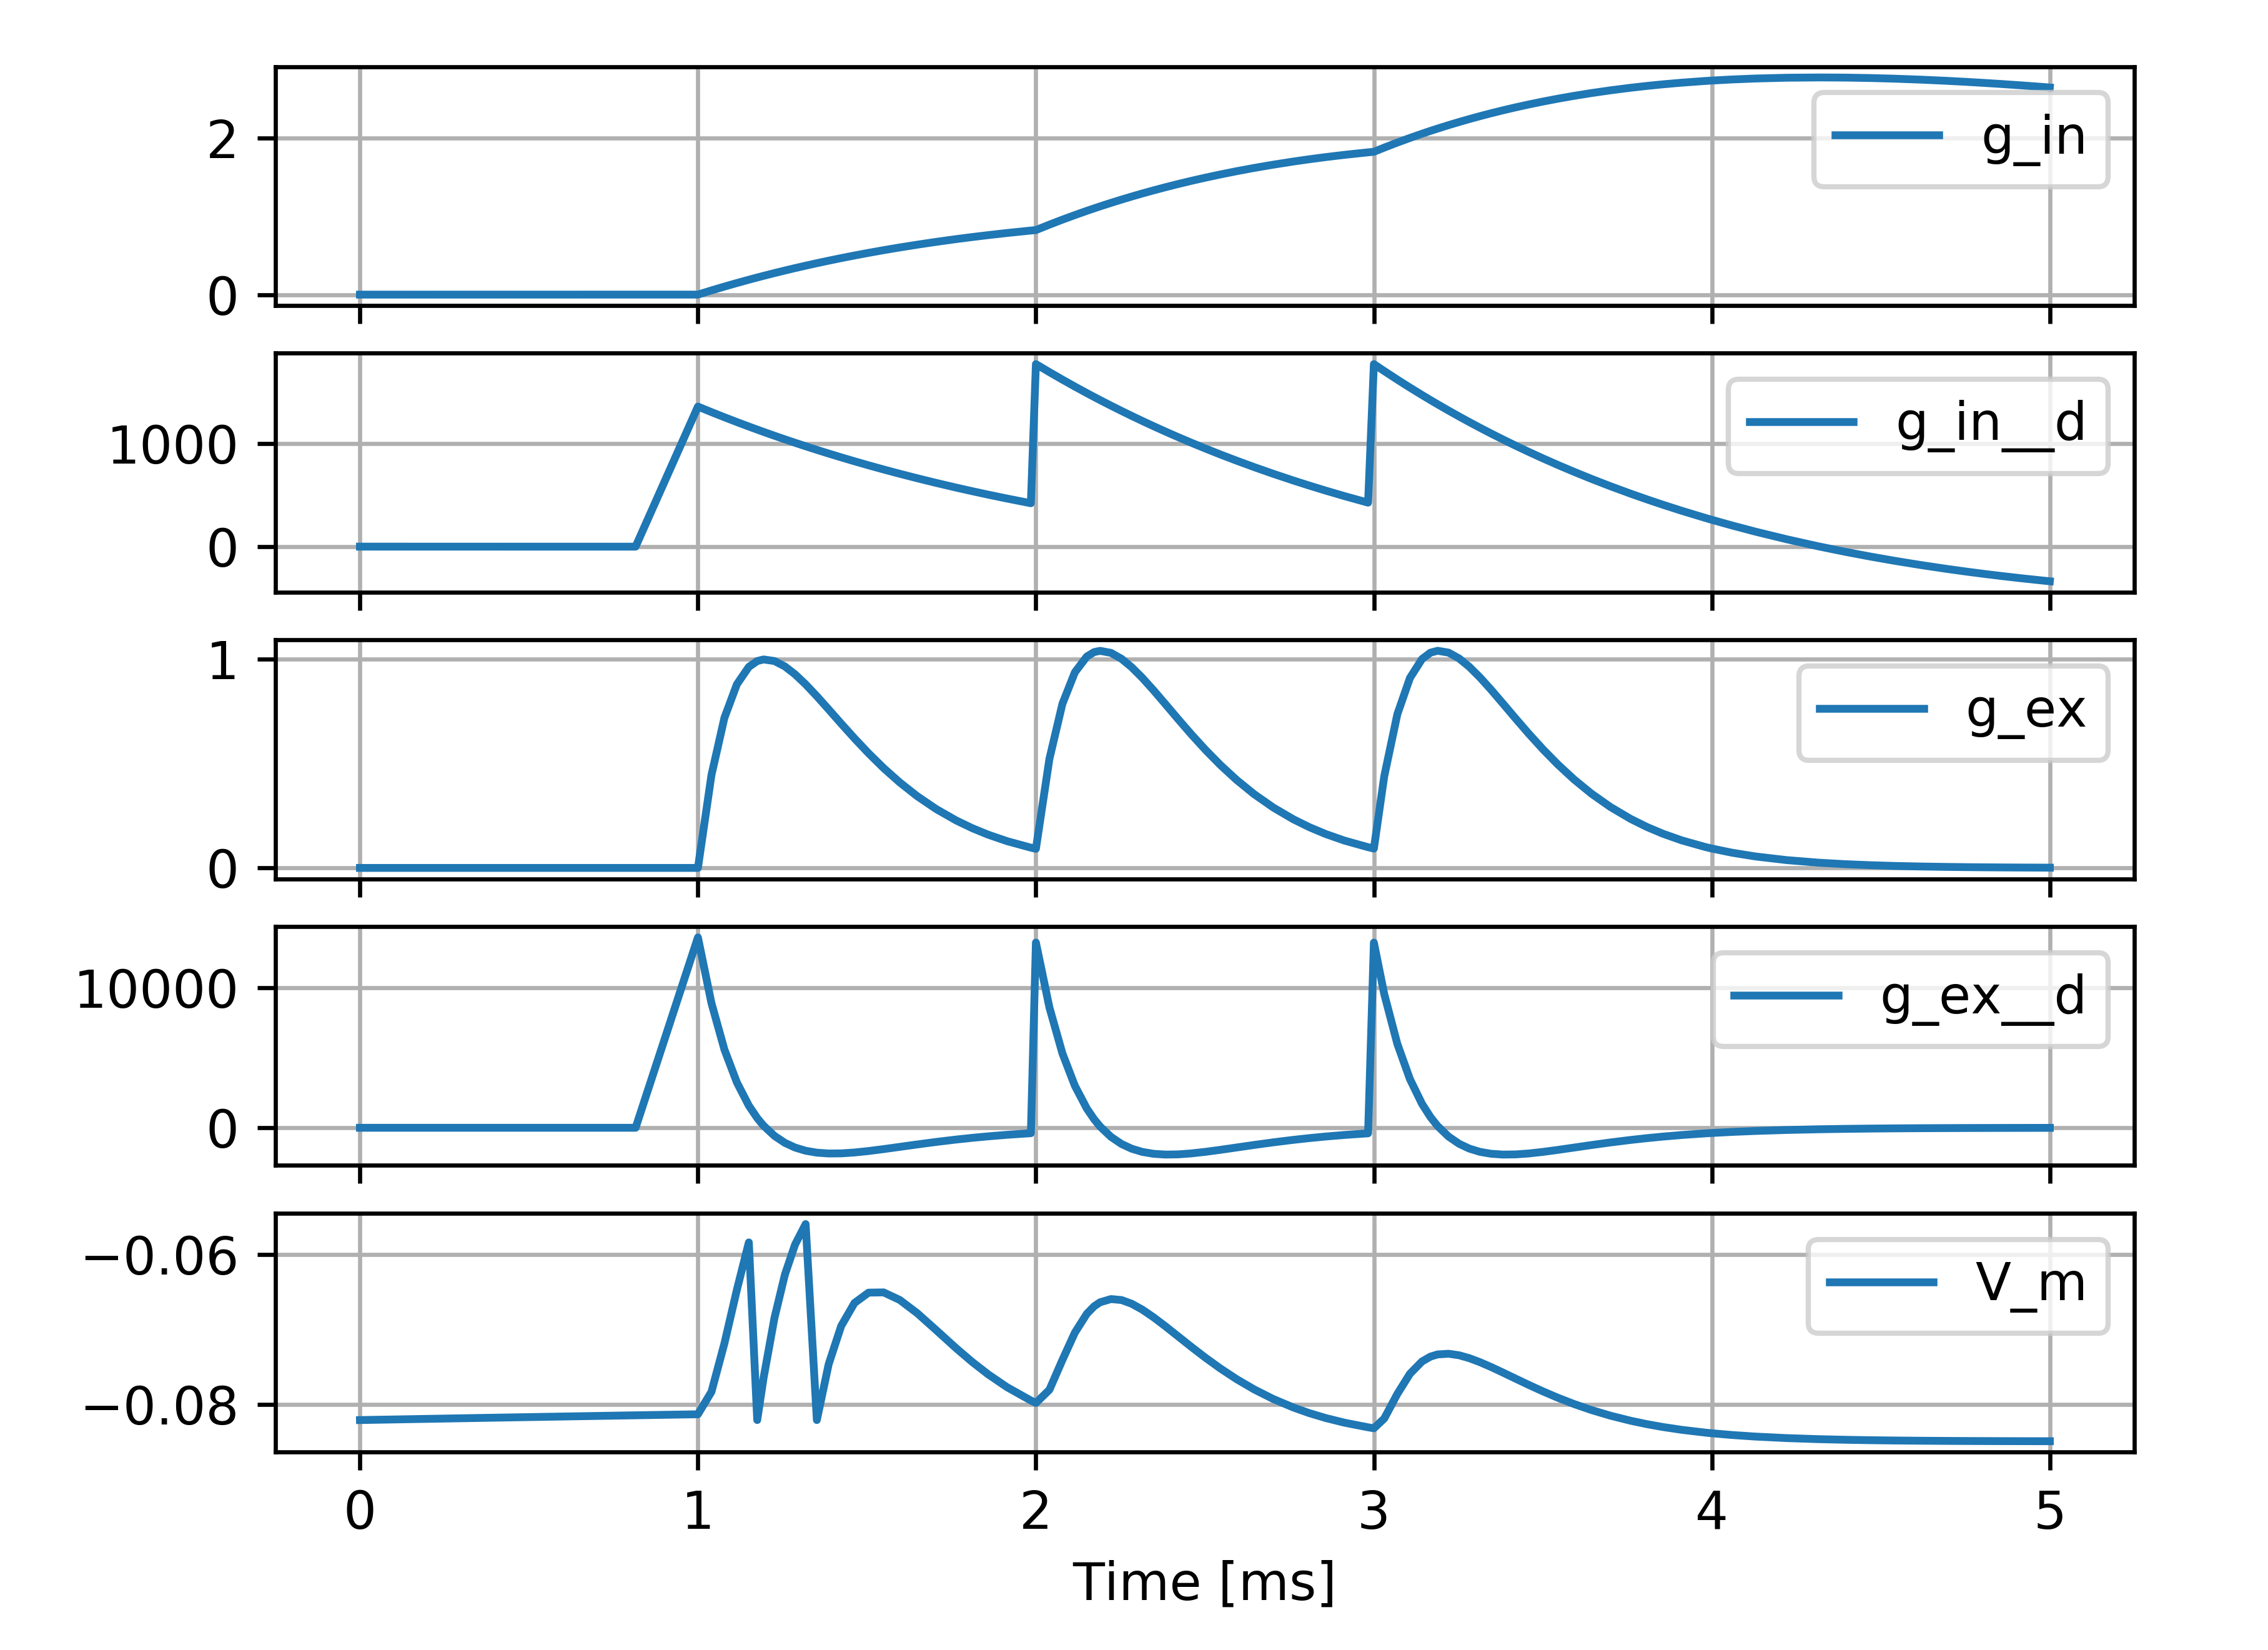 g_in, g_in__d, g_ex, g_ex__d, V_m timeseries plots